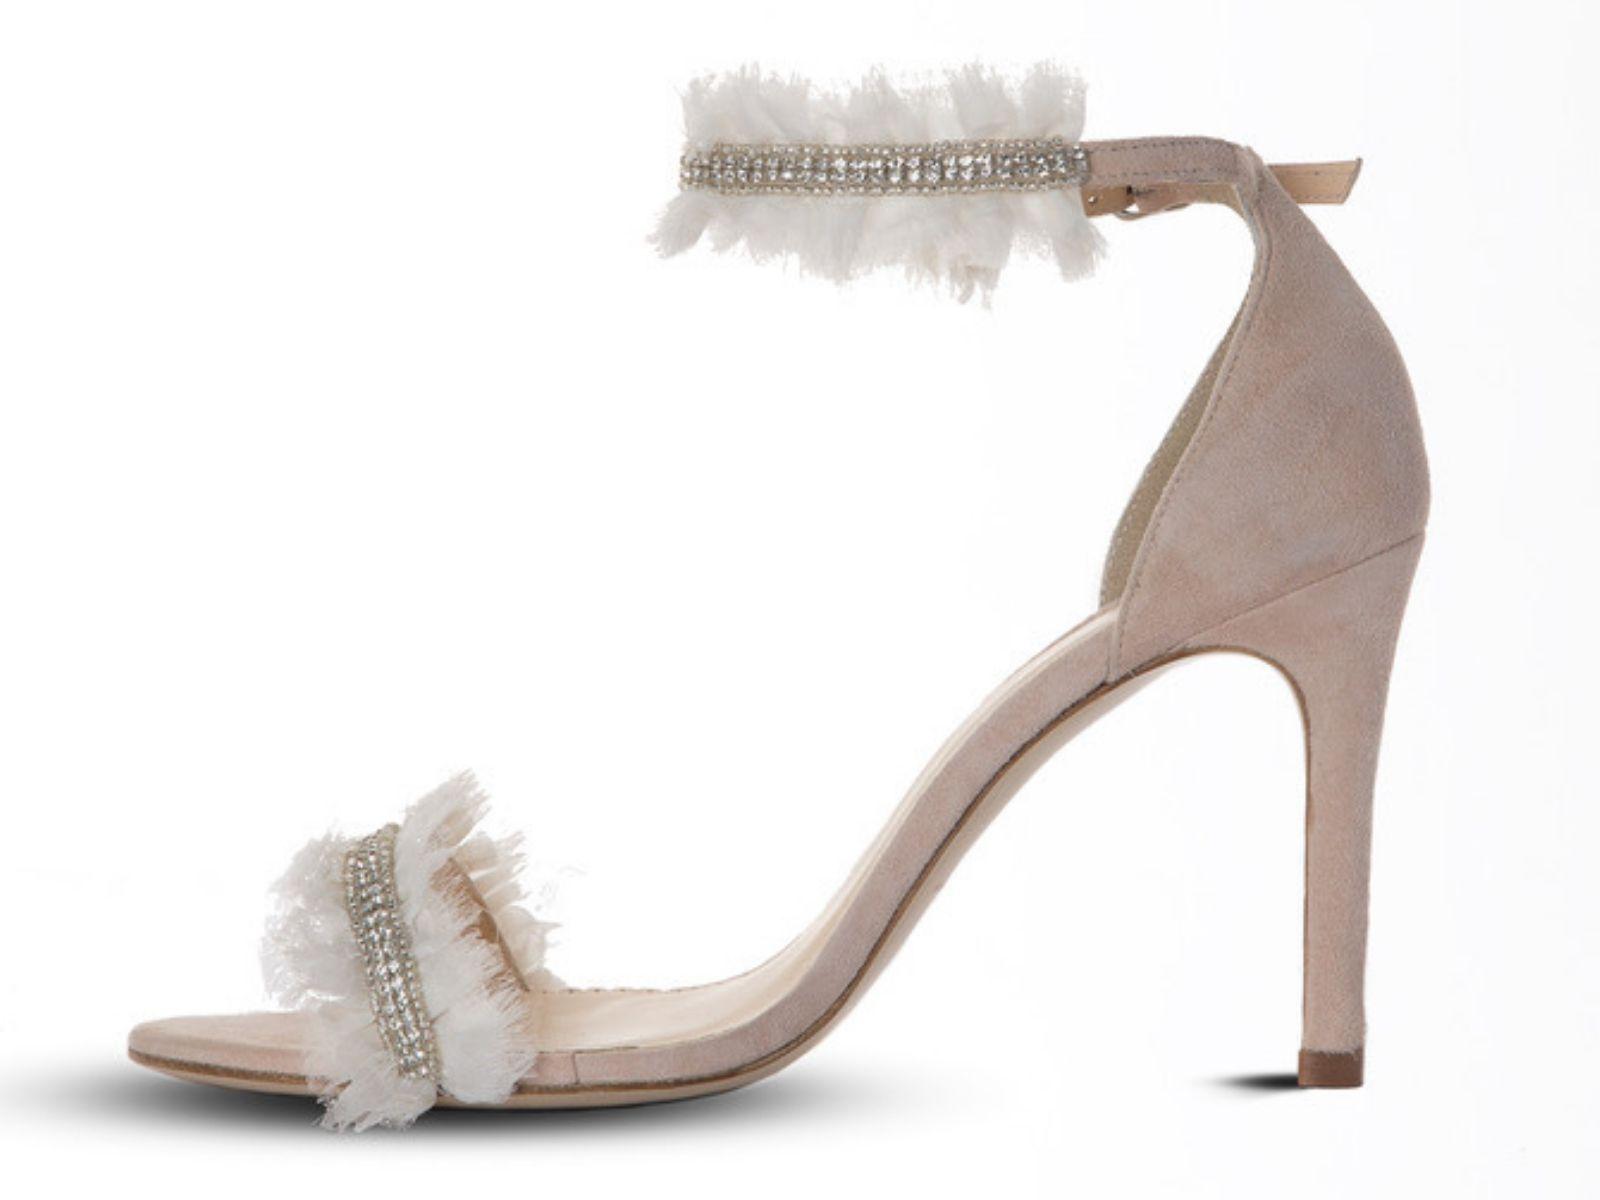 Amarine bohemian wedding shoe Boho bride boutique